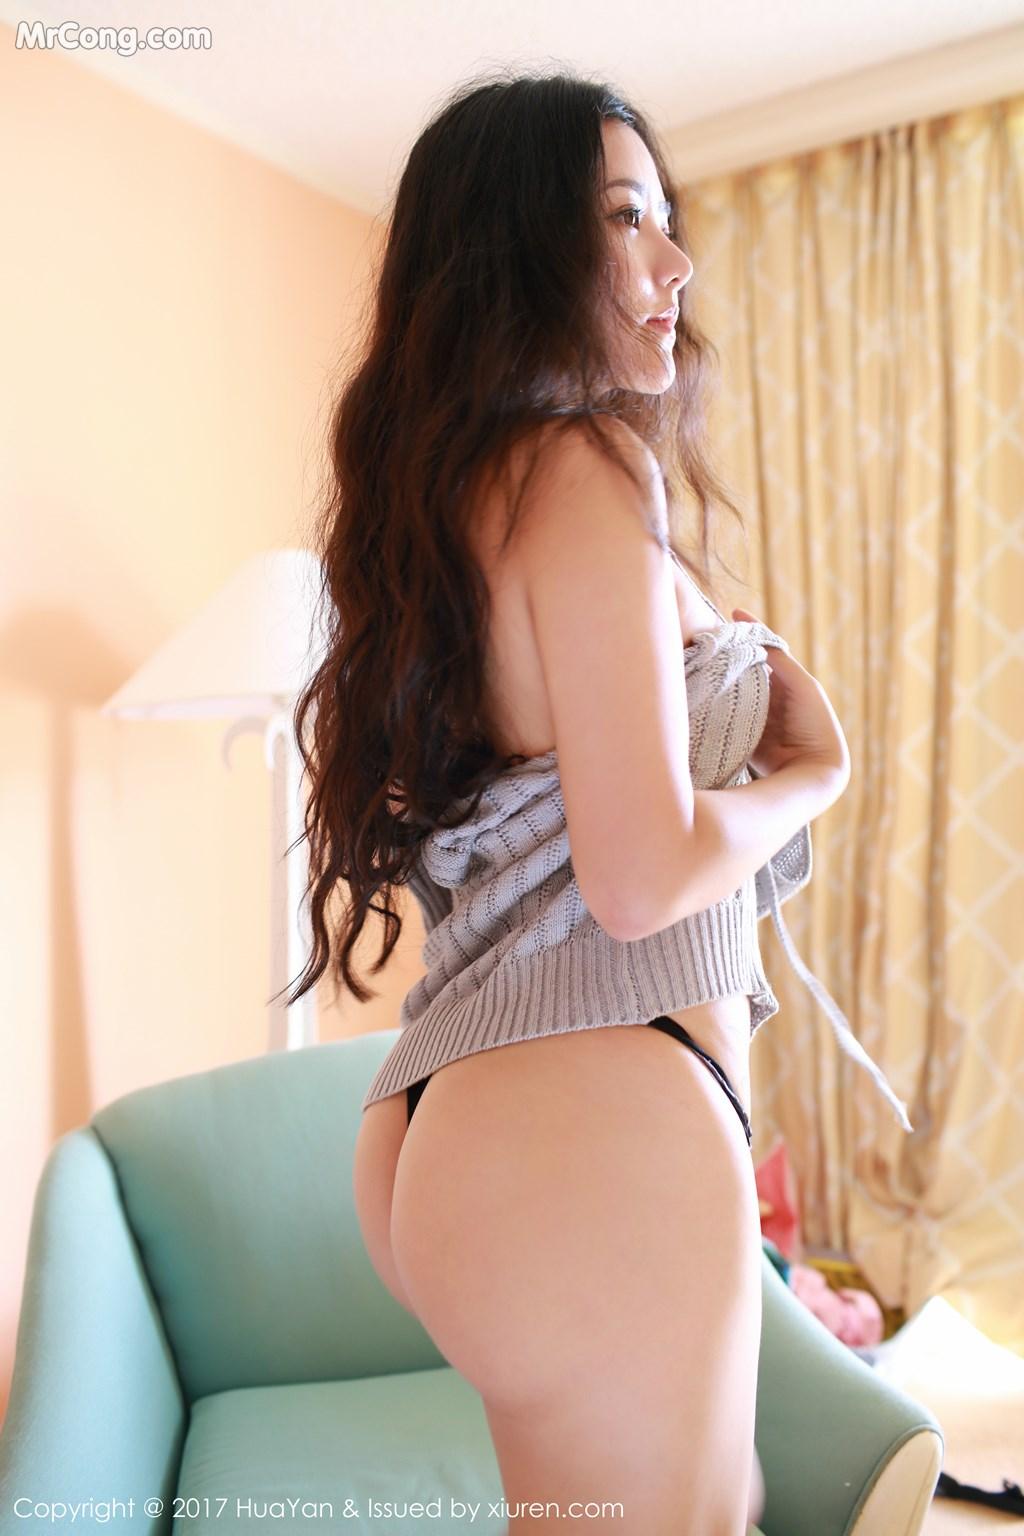 Image HuaYan-Vol.047-Manuela-MrCong.com-006 in post HuaYan Vol.047: Người mẫu Manuela (玛鲁娜) (47 ảnh)